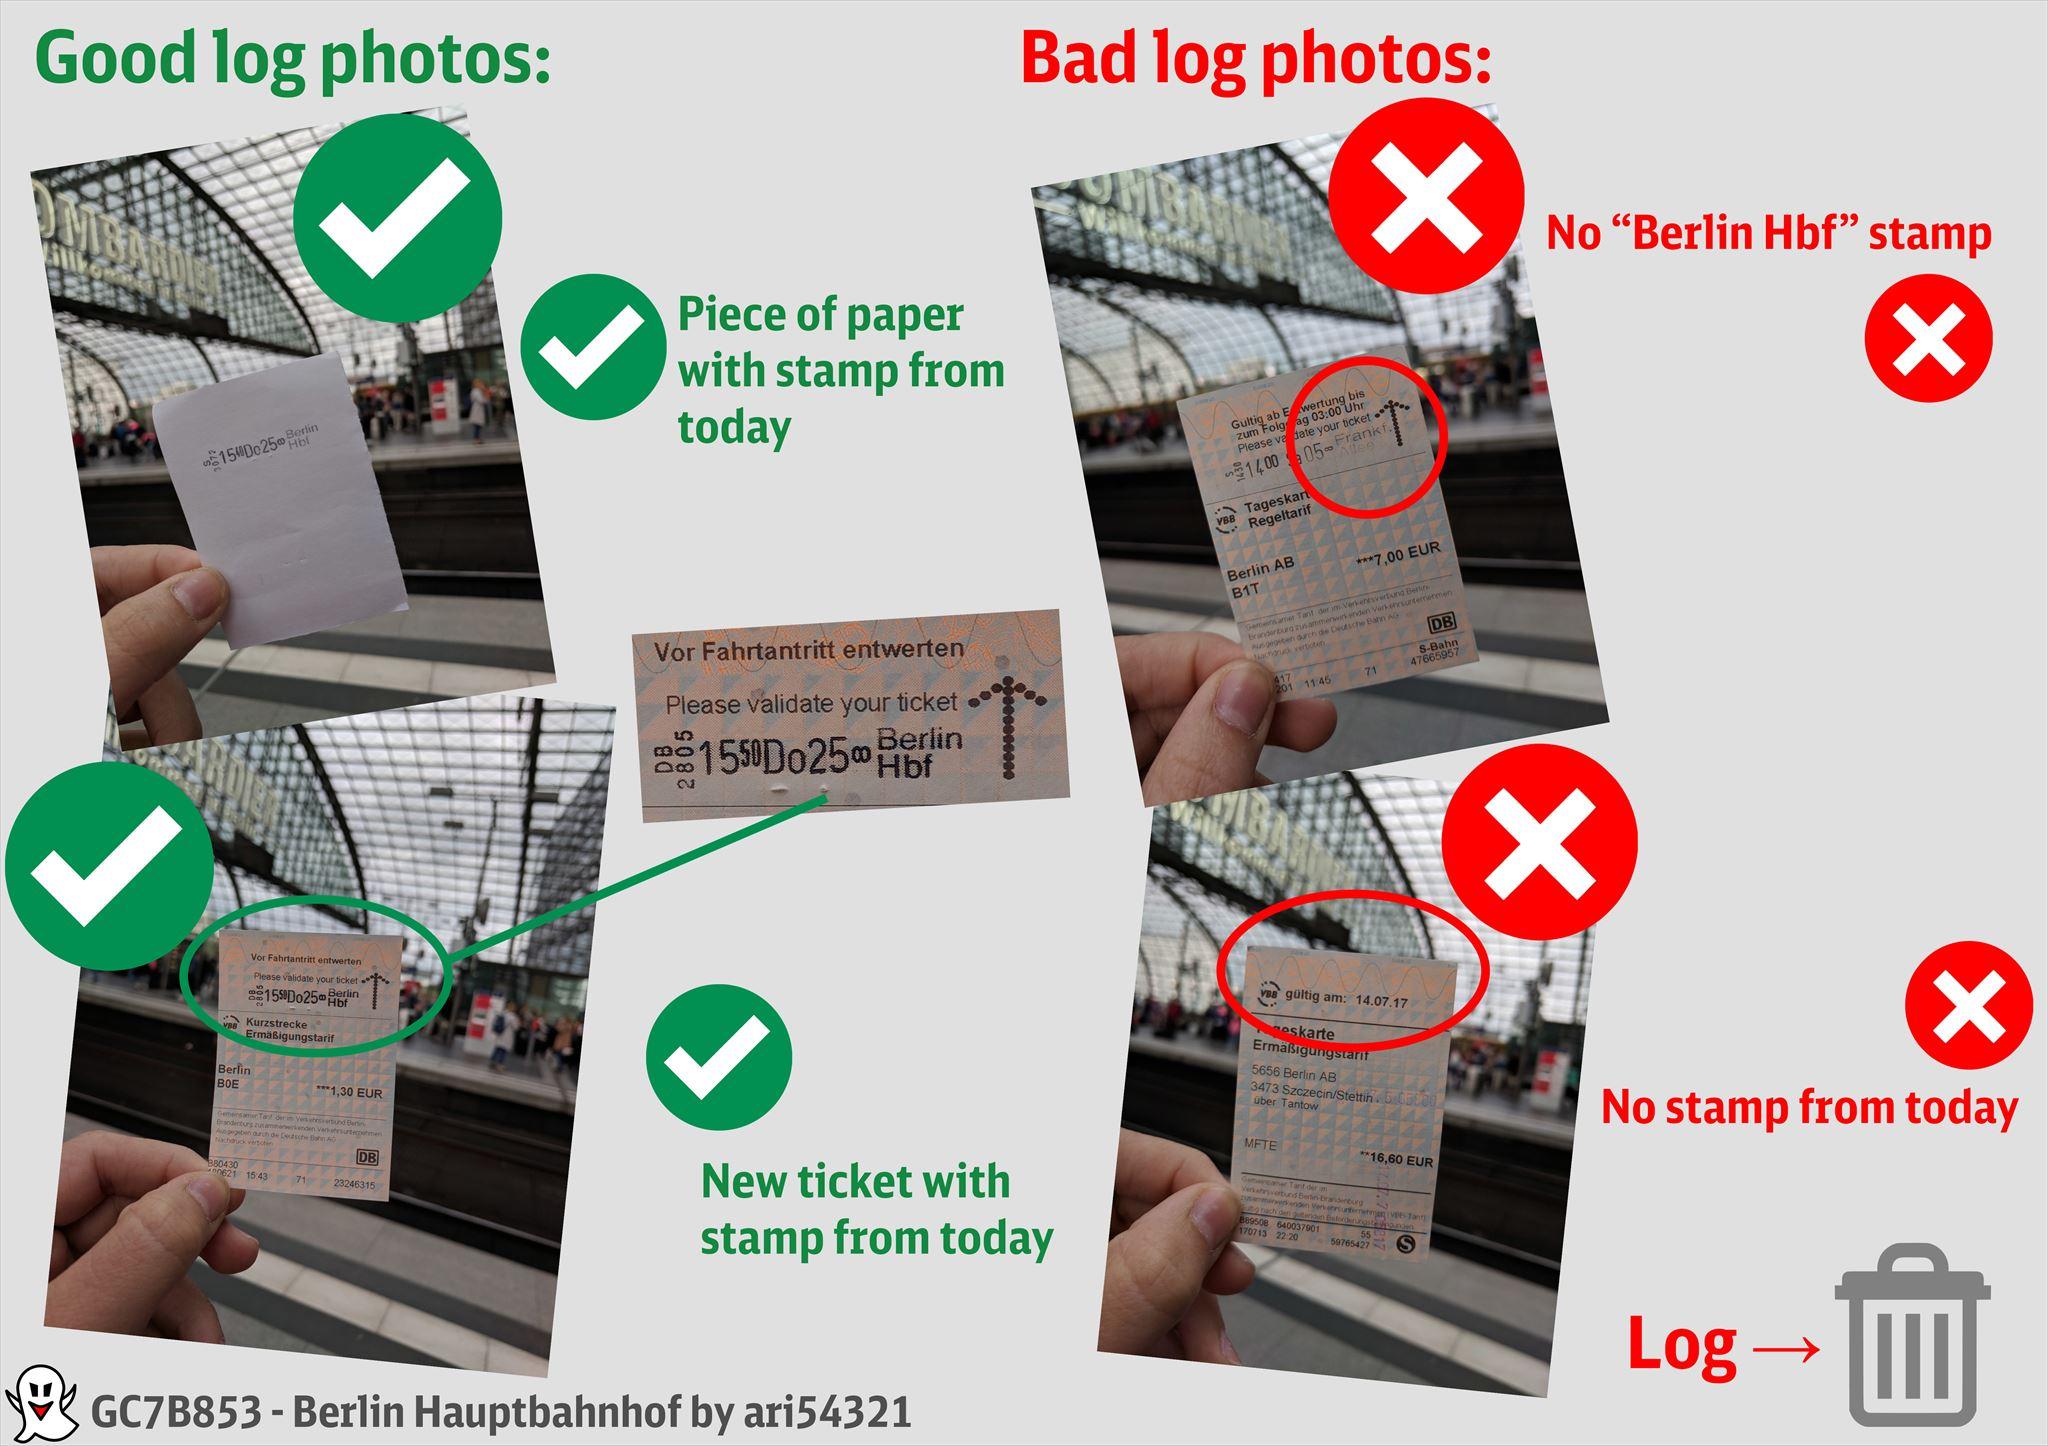 Log photo examples